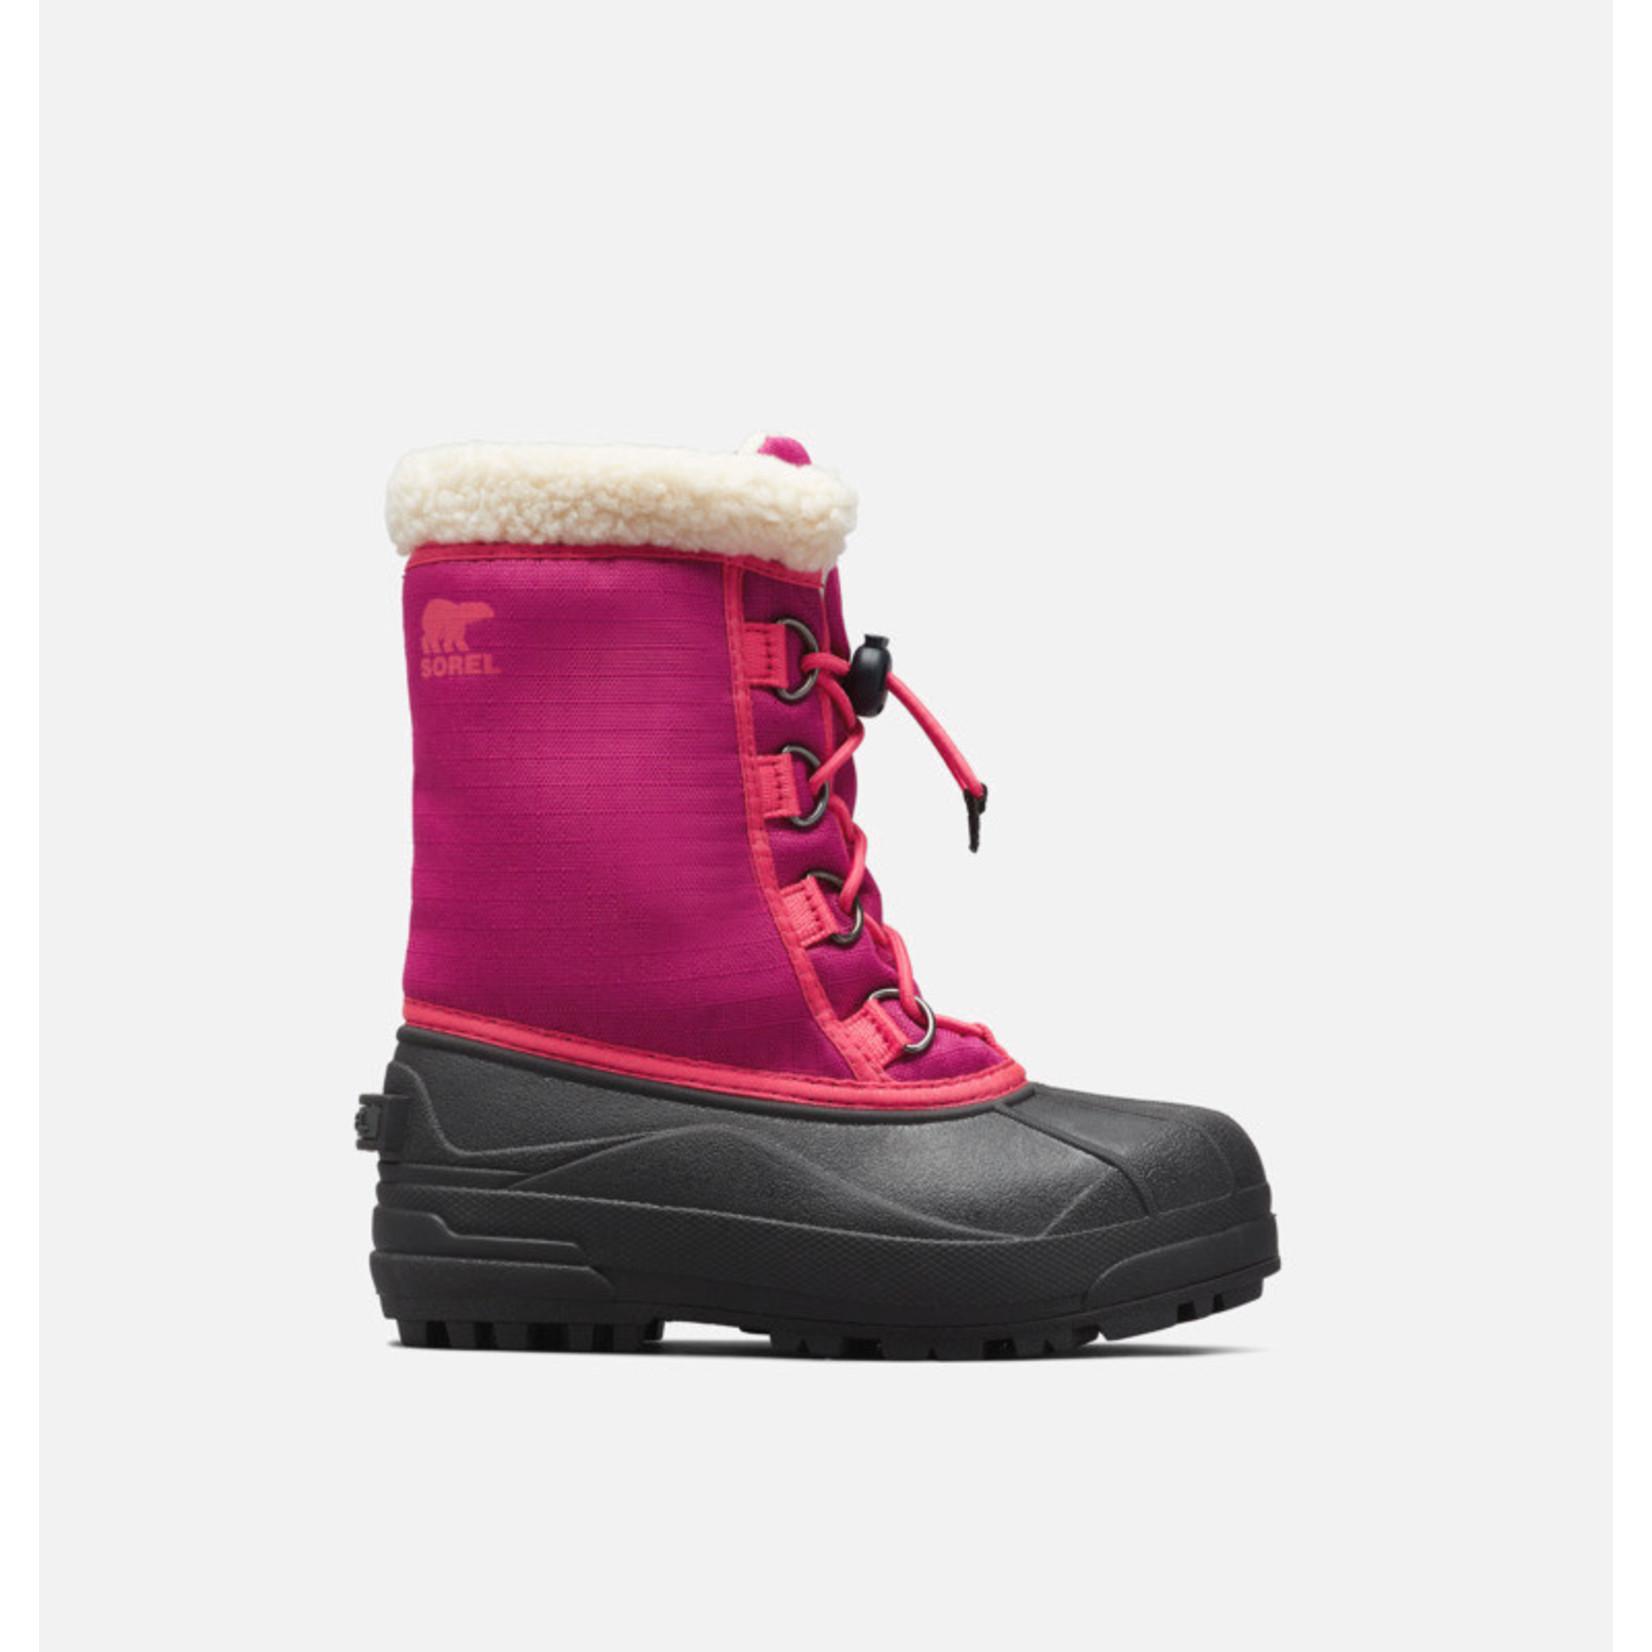 Sorel Sorel Boots, Youth Cumberland, Girls